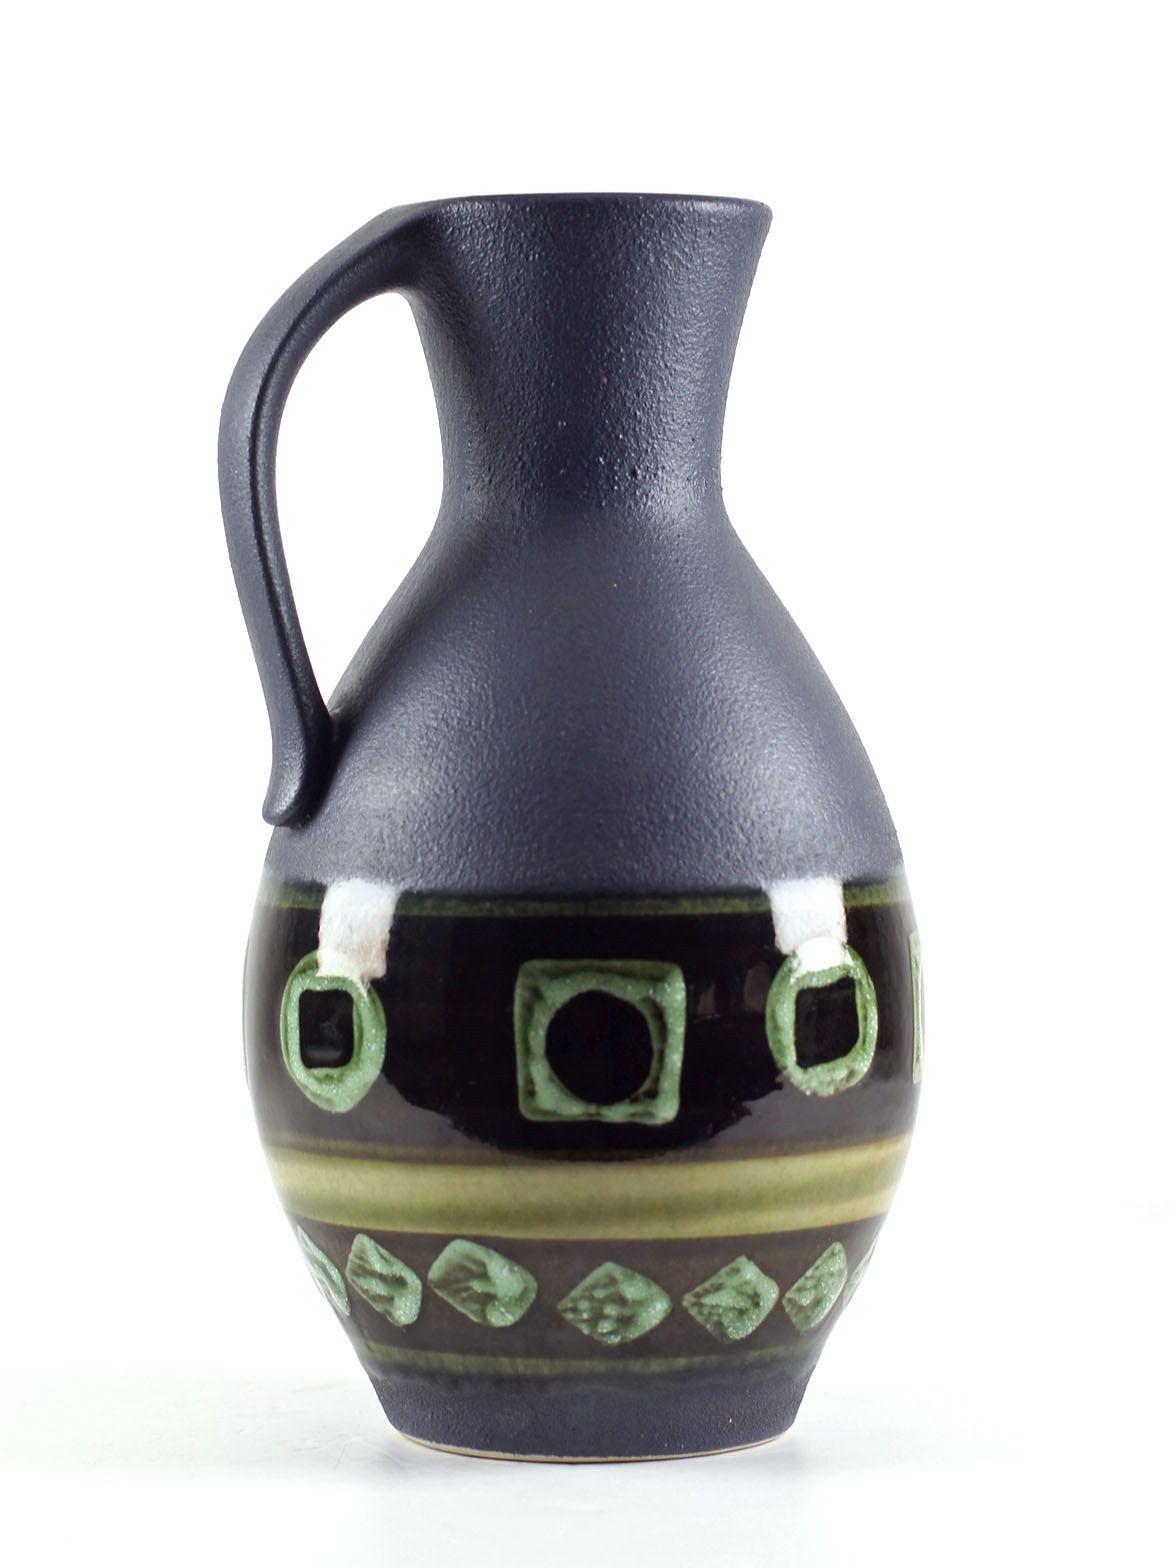 Dumler Breiden Keramik 60 70s Retro West German Pottery Grau Grün